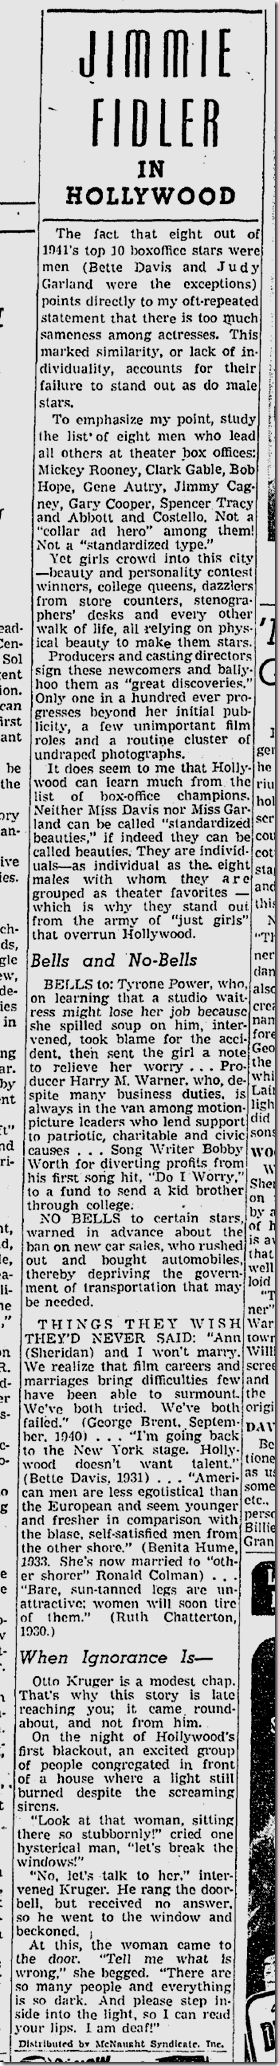 Feb. 2, 1942, Jimmie Fidler